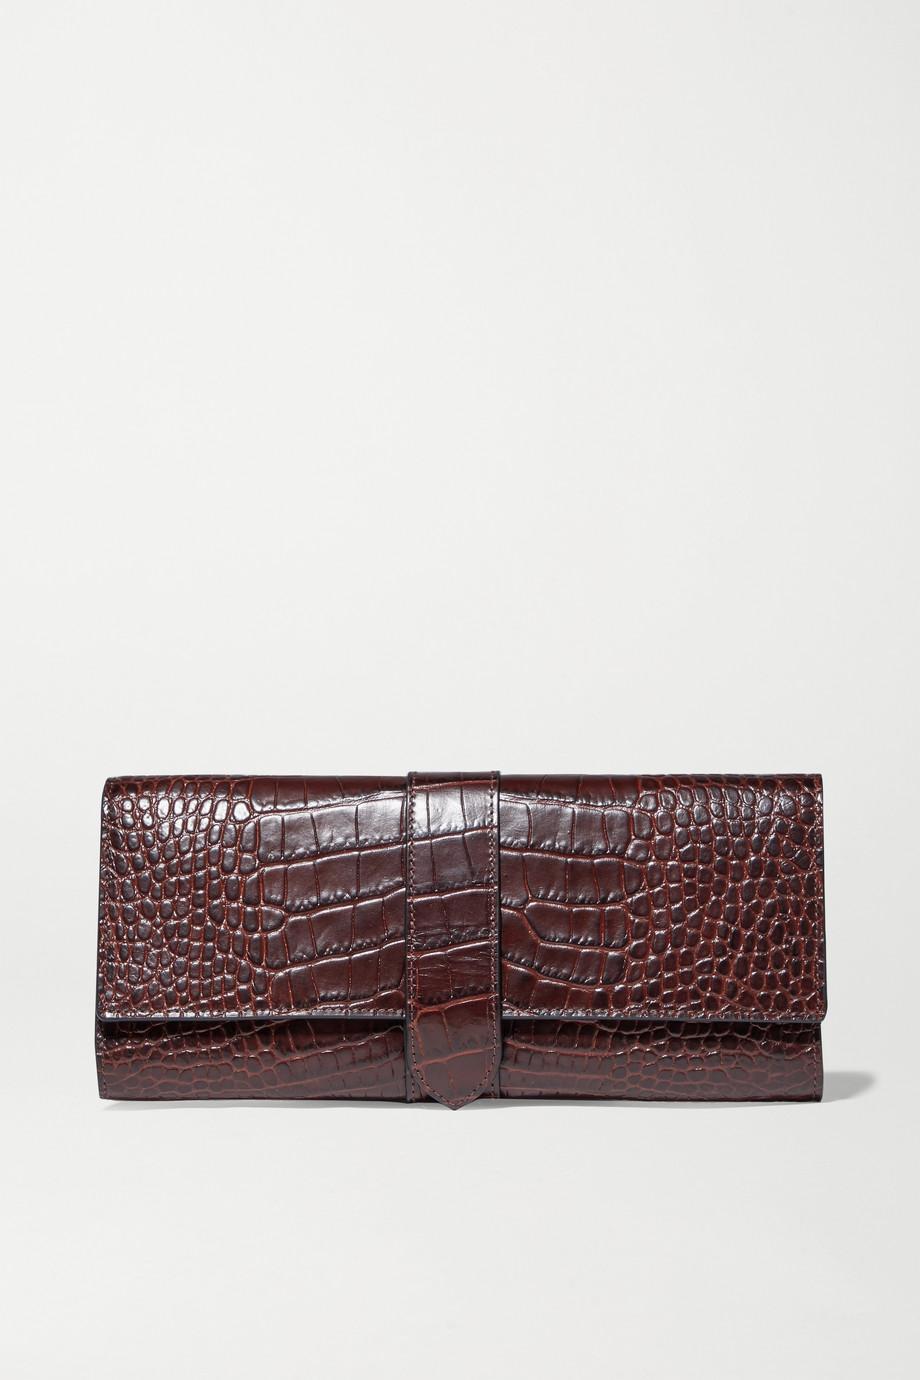 Smythson Mara croc-effect leather jewelry roll